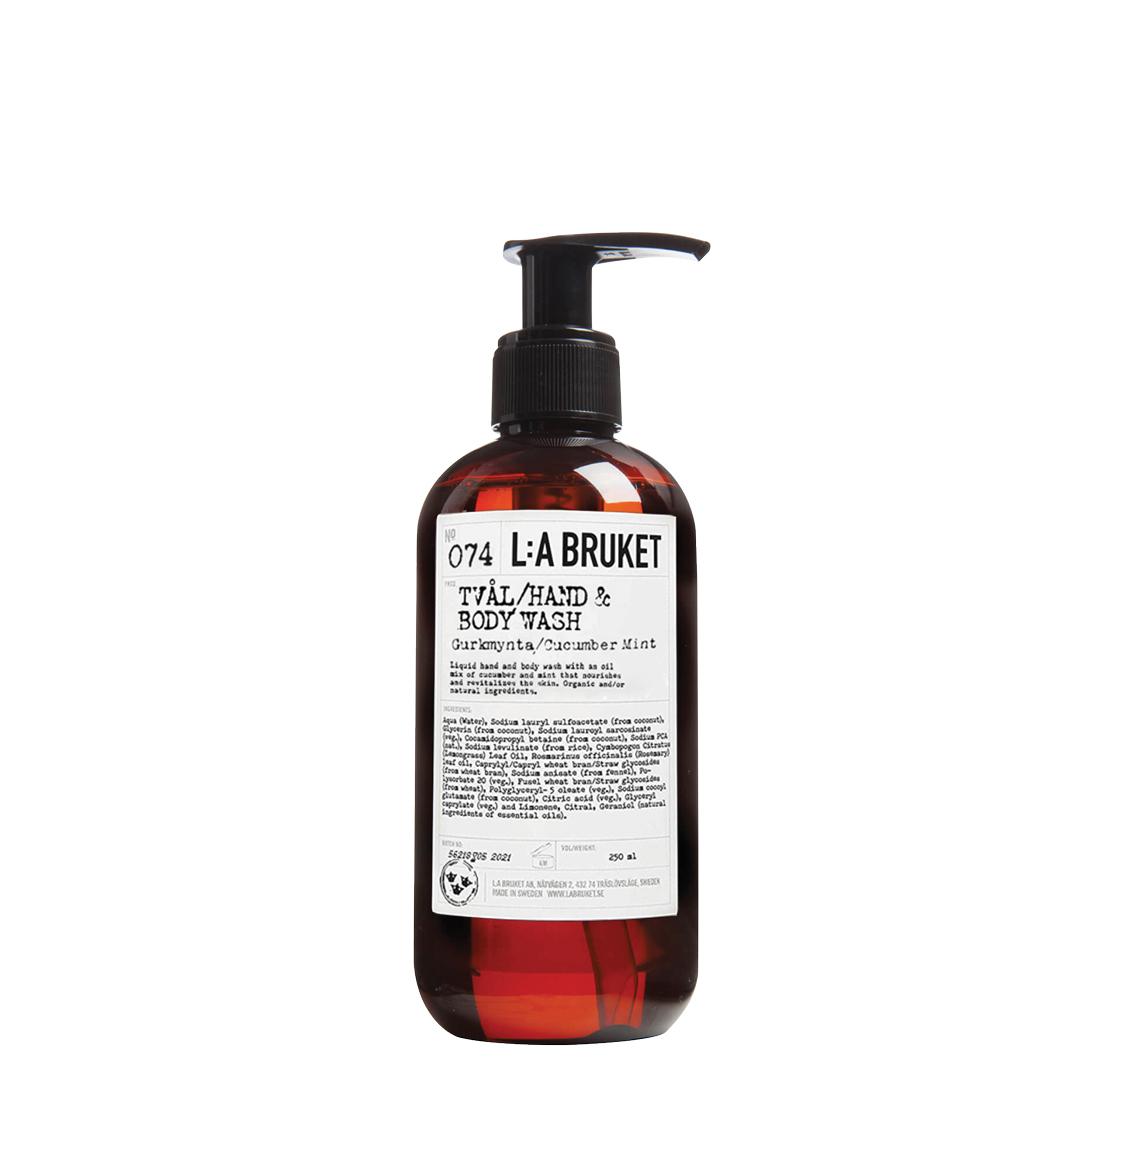 LA Bruket 074 Hand and Body Wash Cucumber and Mint 240ml